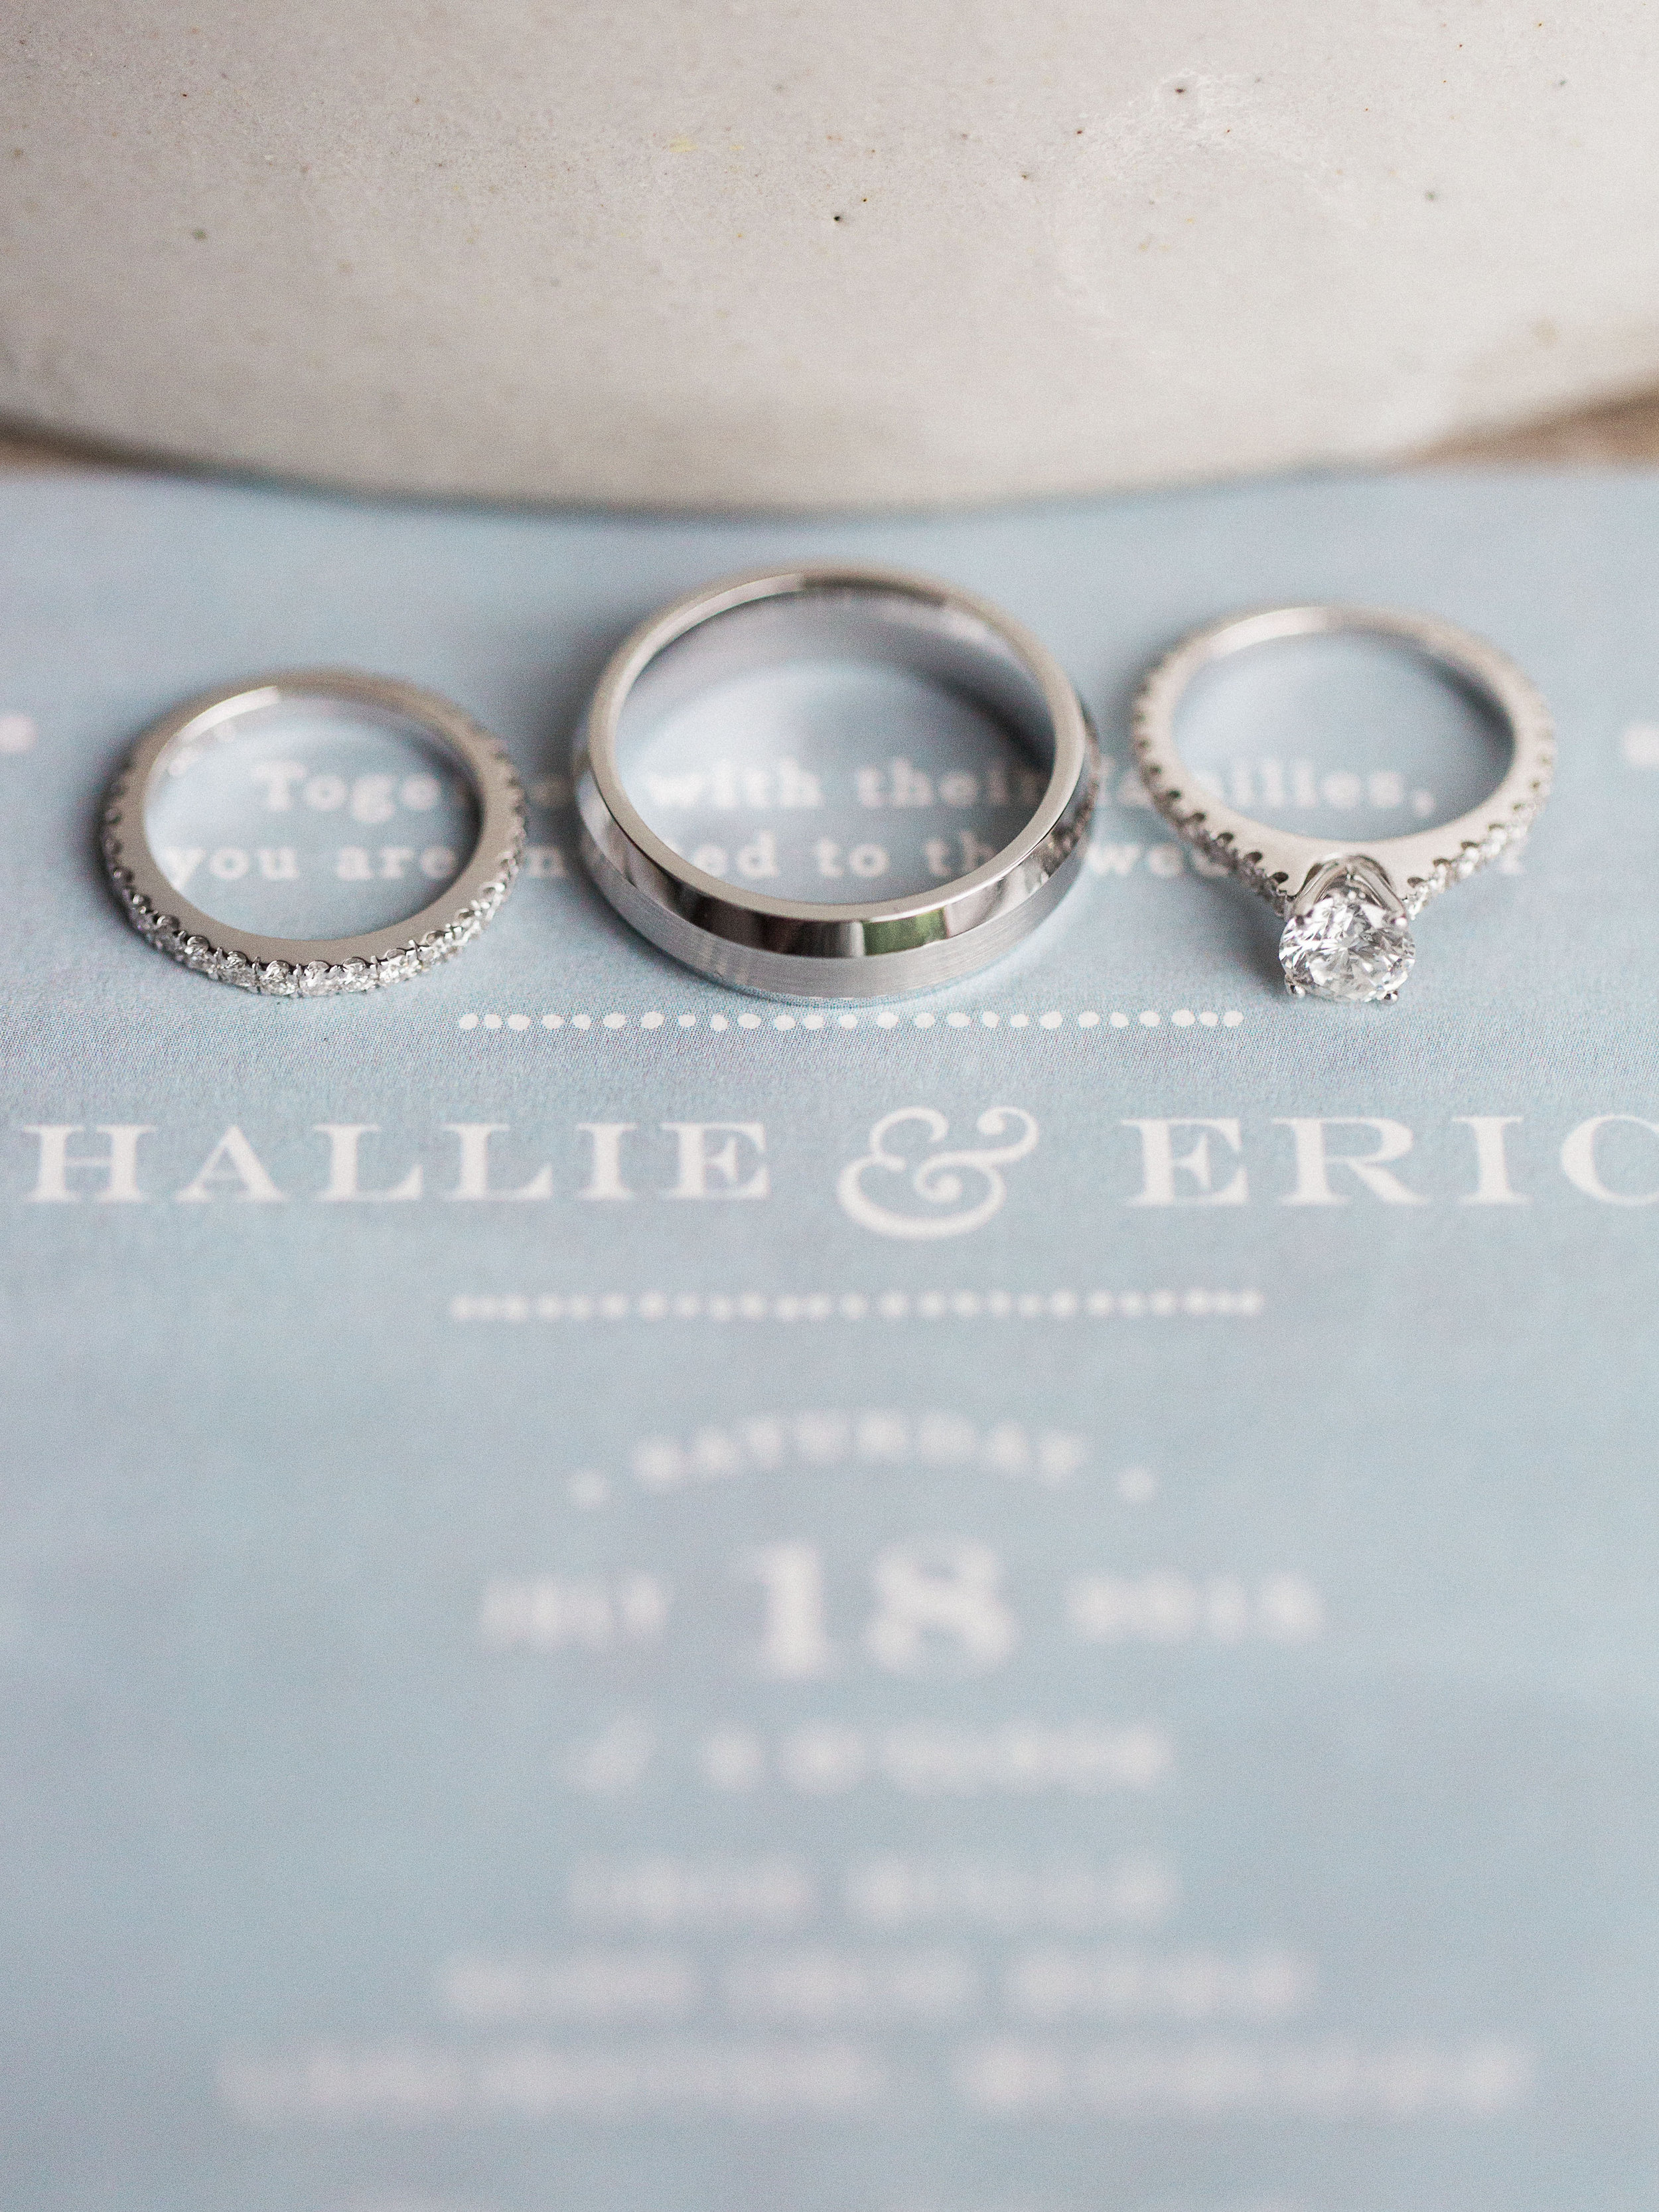 ERIC AND HALLIE WEDDING-HI RESOLUTION FOR PRINTING-0003.jpg